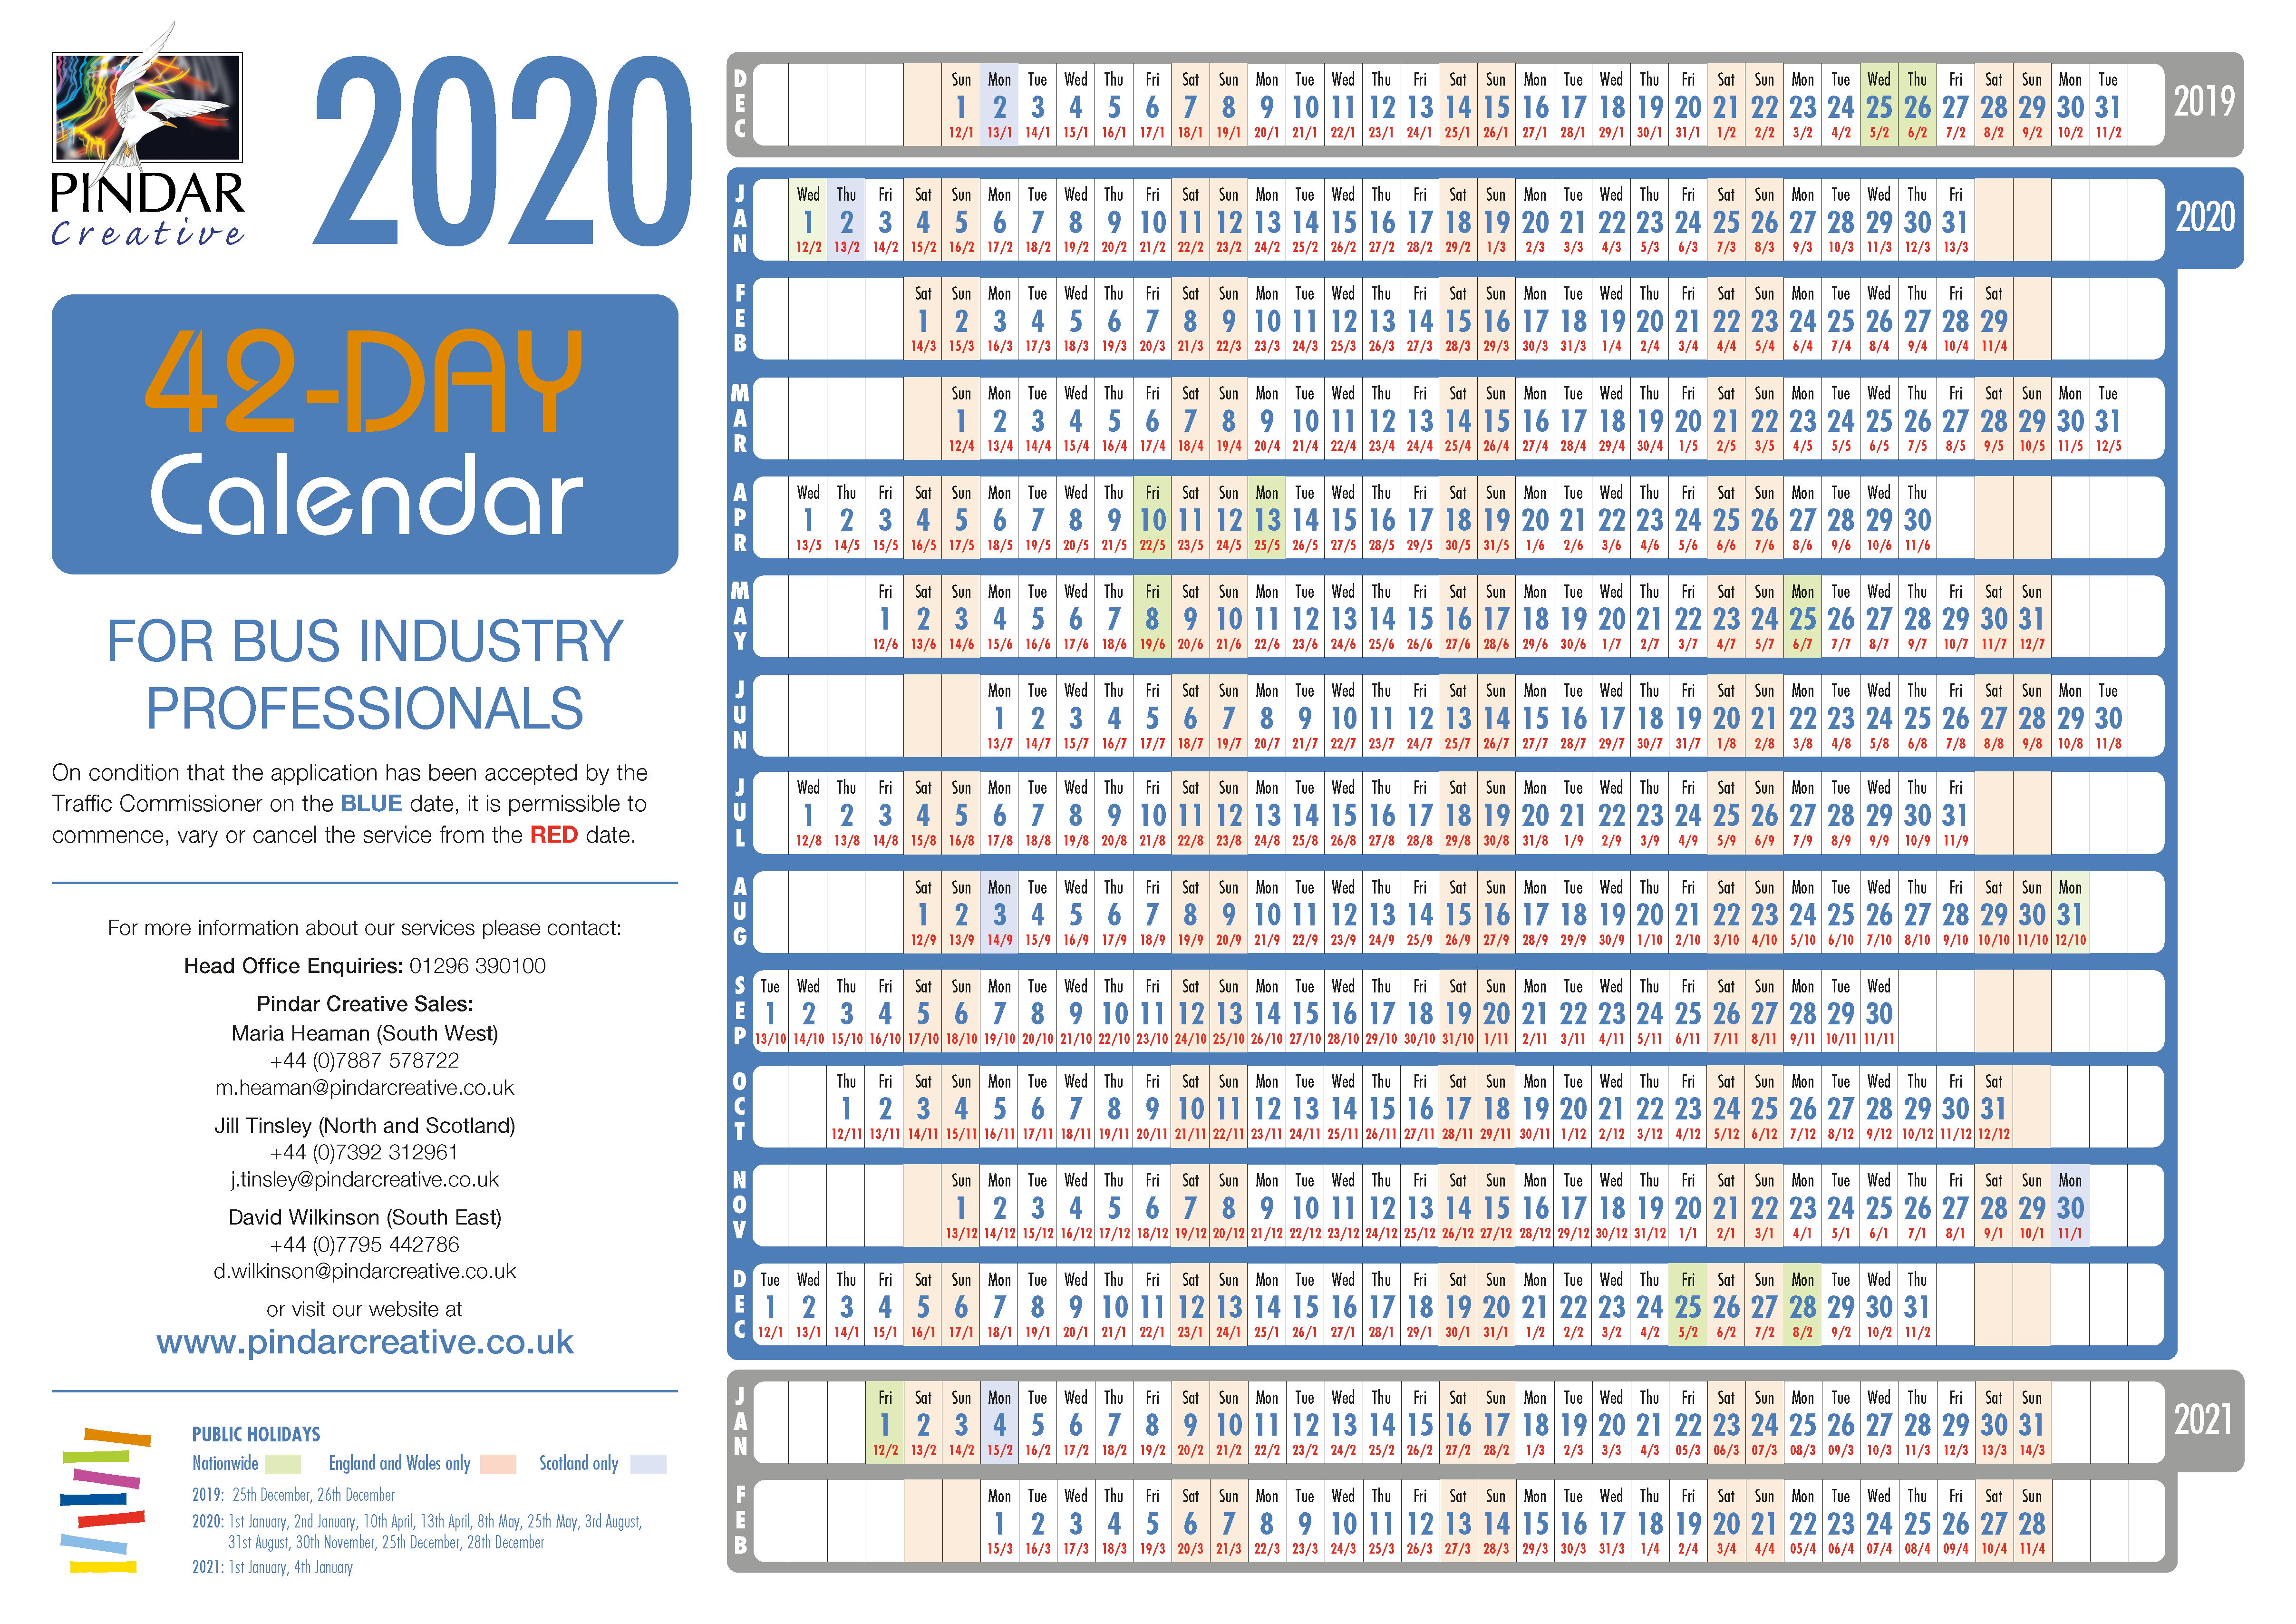 56Day Calendar By Pindar Creative (Catalogues, Ecommerce for Barr Beacon Calendar